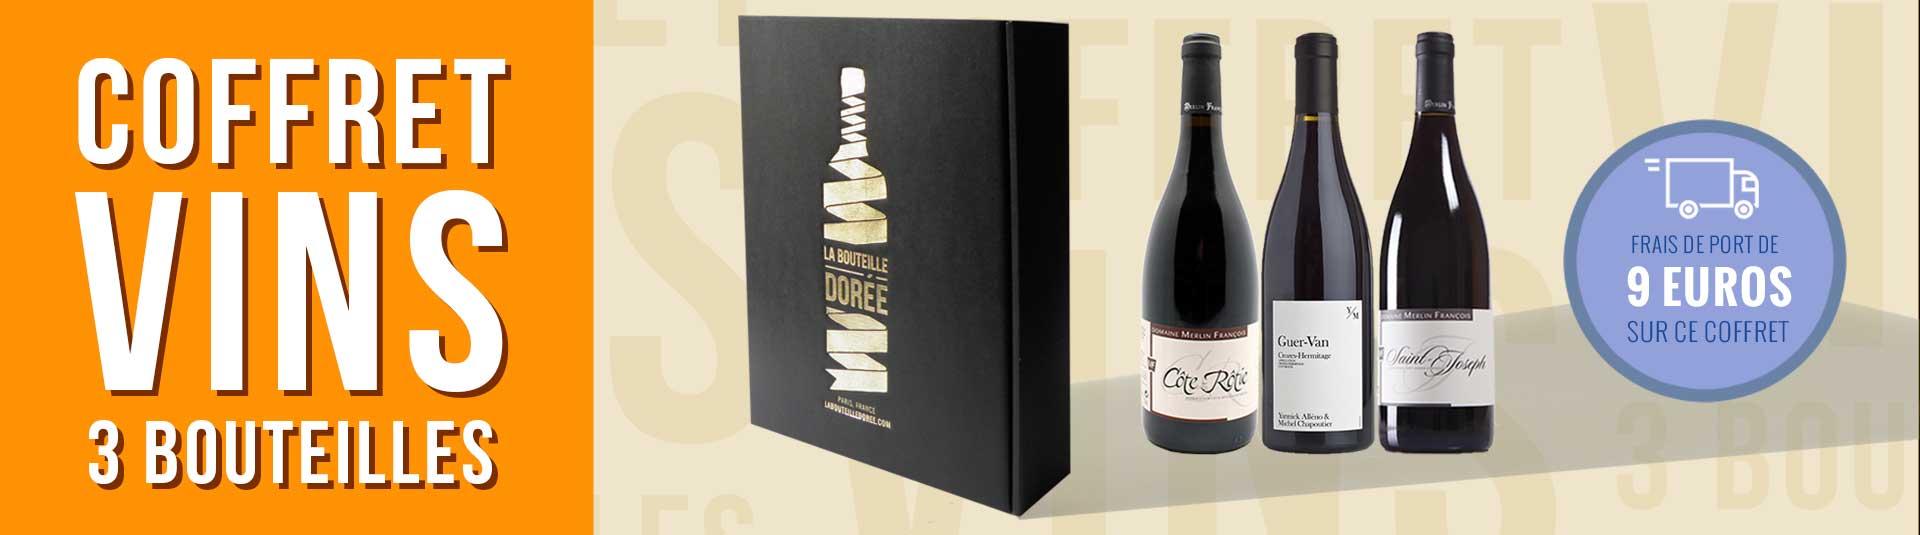 coffret vin Rhône 3 bouteilles cépage Syrah